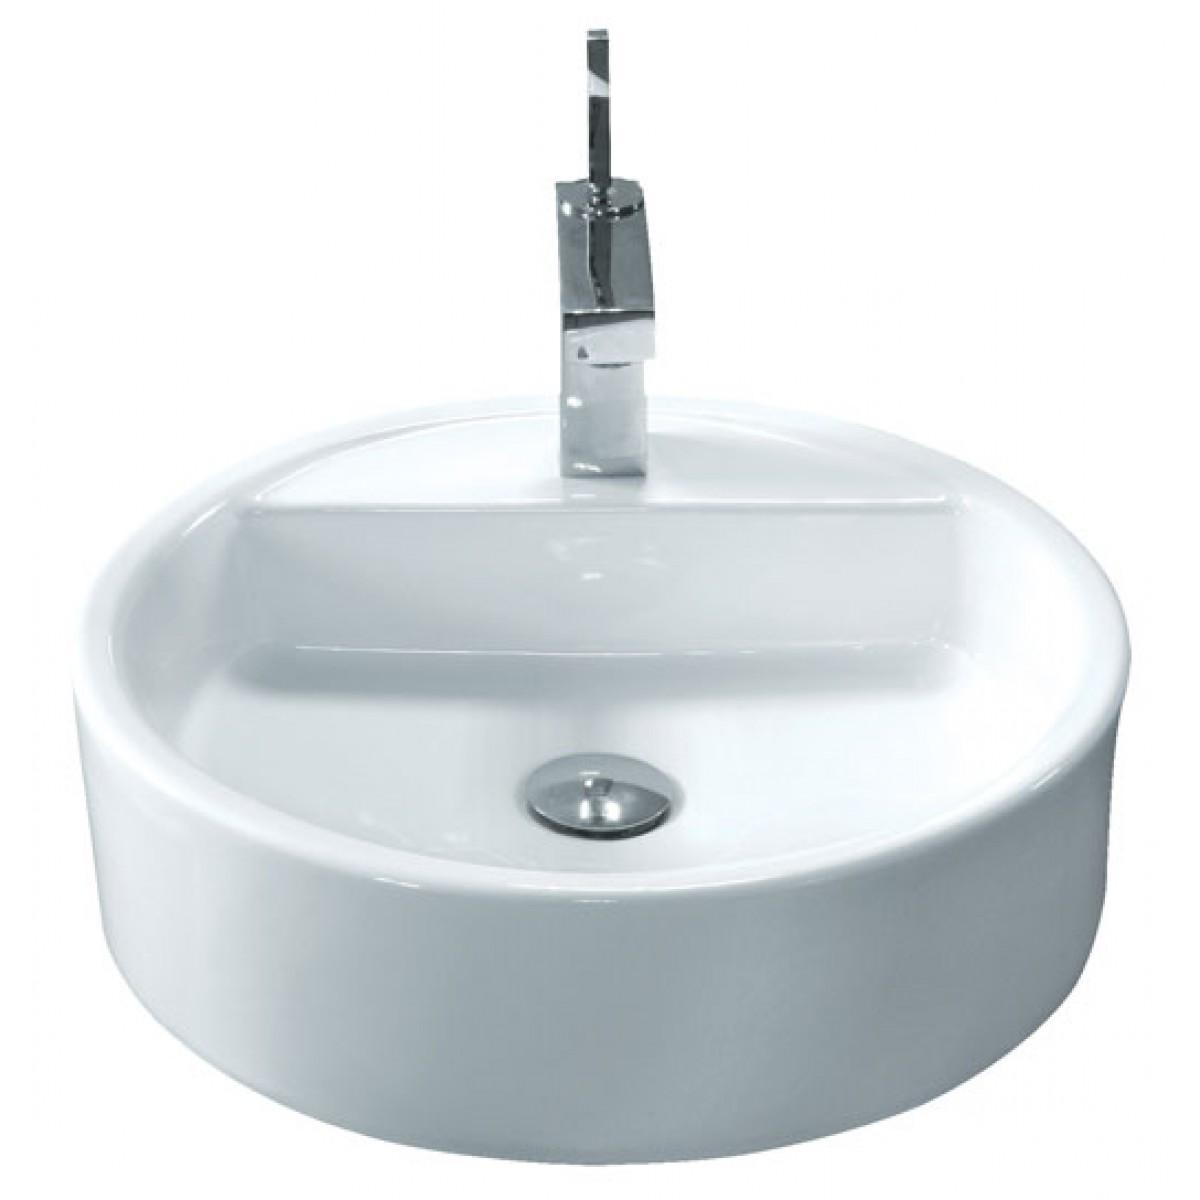 3 Hole Vessel Sink : ... Ceramic Single Hole Countertop Bathroom Vessel Sink - 18 x 4 Inch